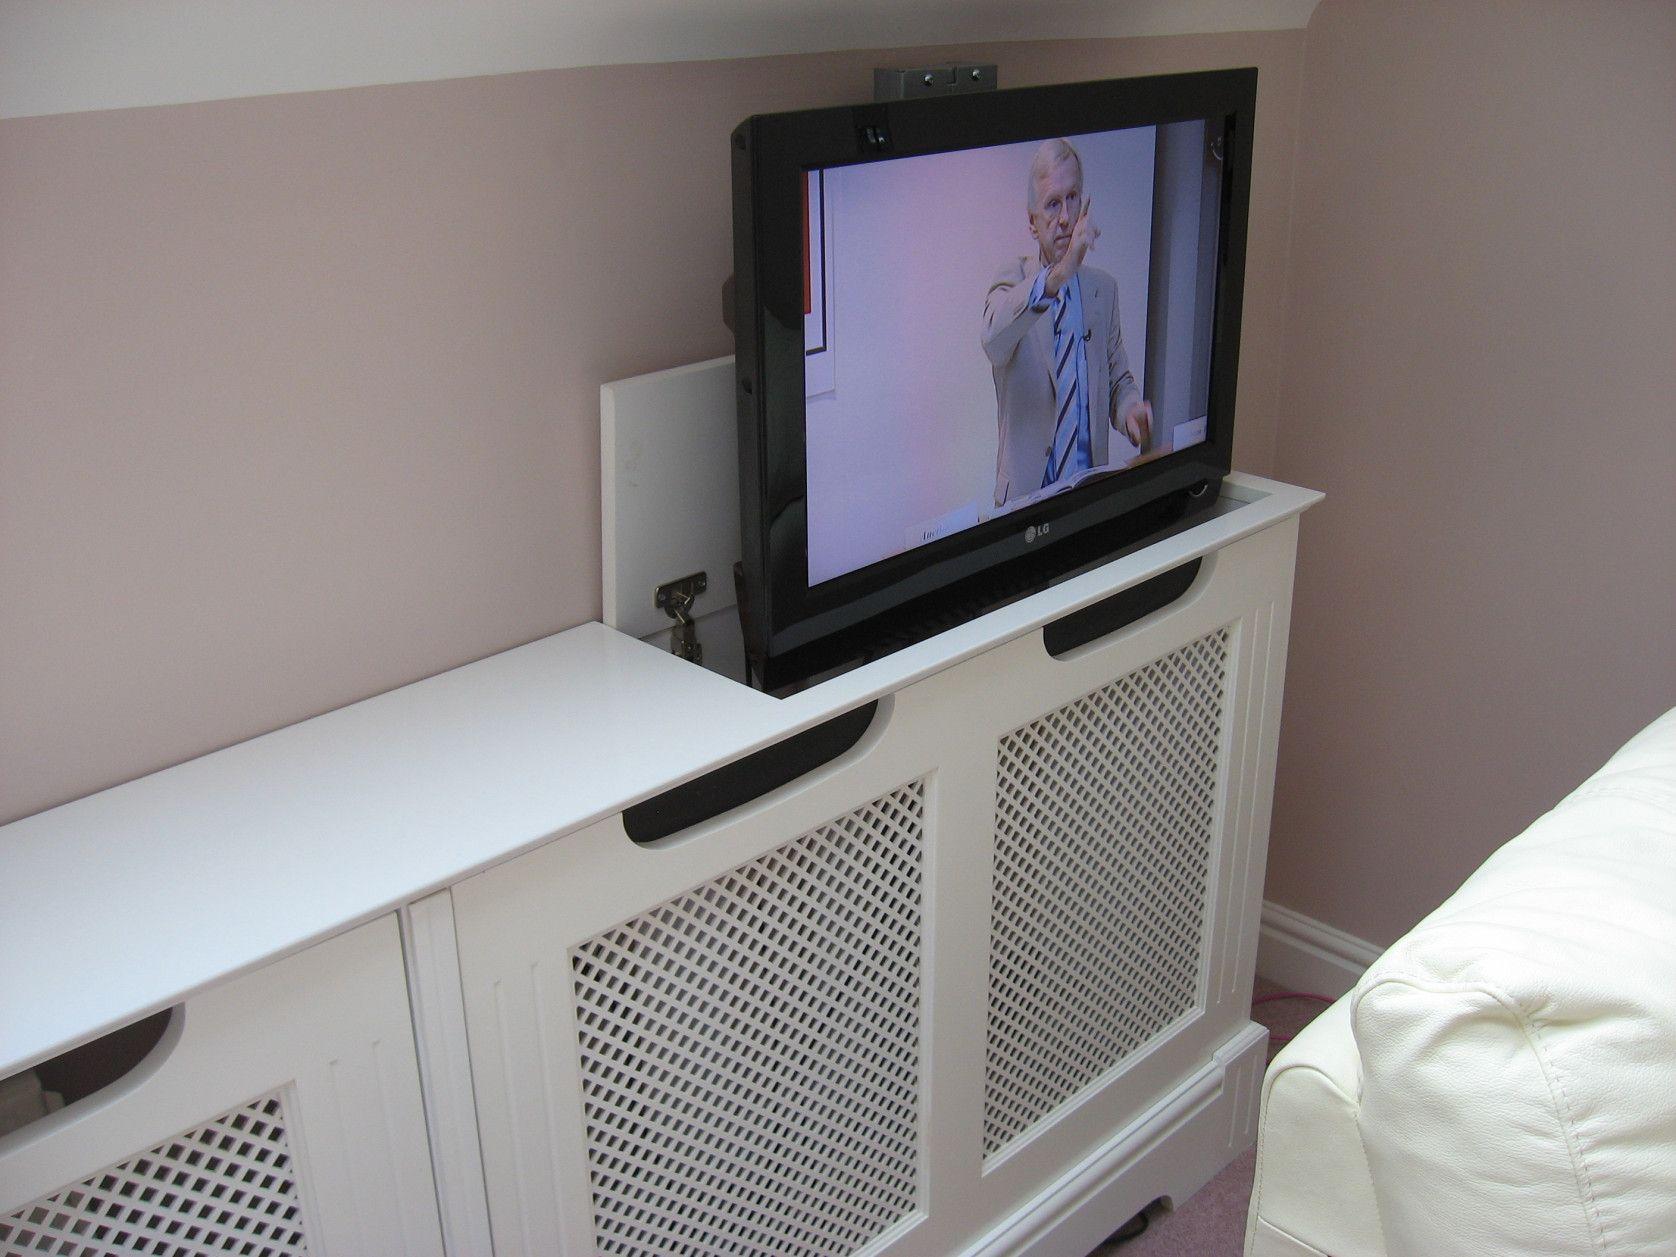 Pin By Rahayu12 On Interior Analogi Pop Up Tv Cabinet Tv